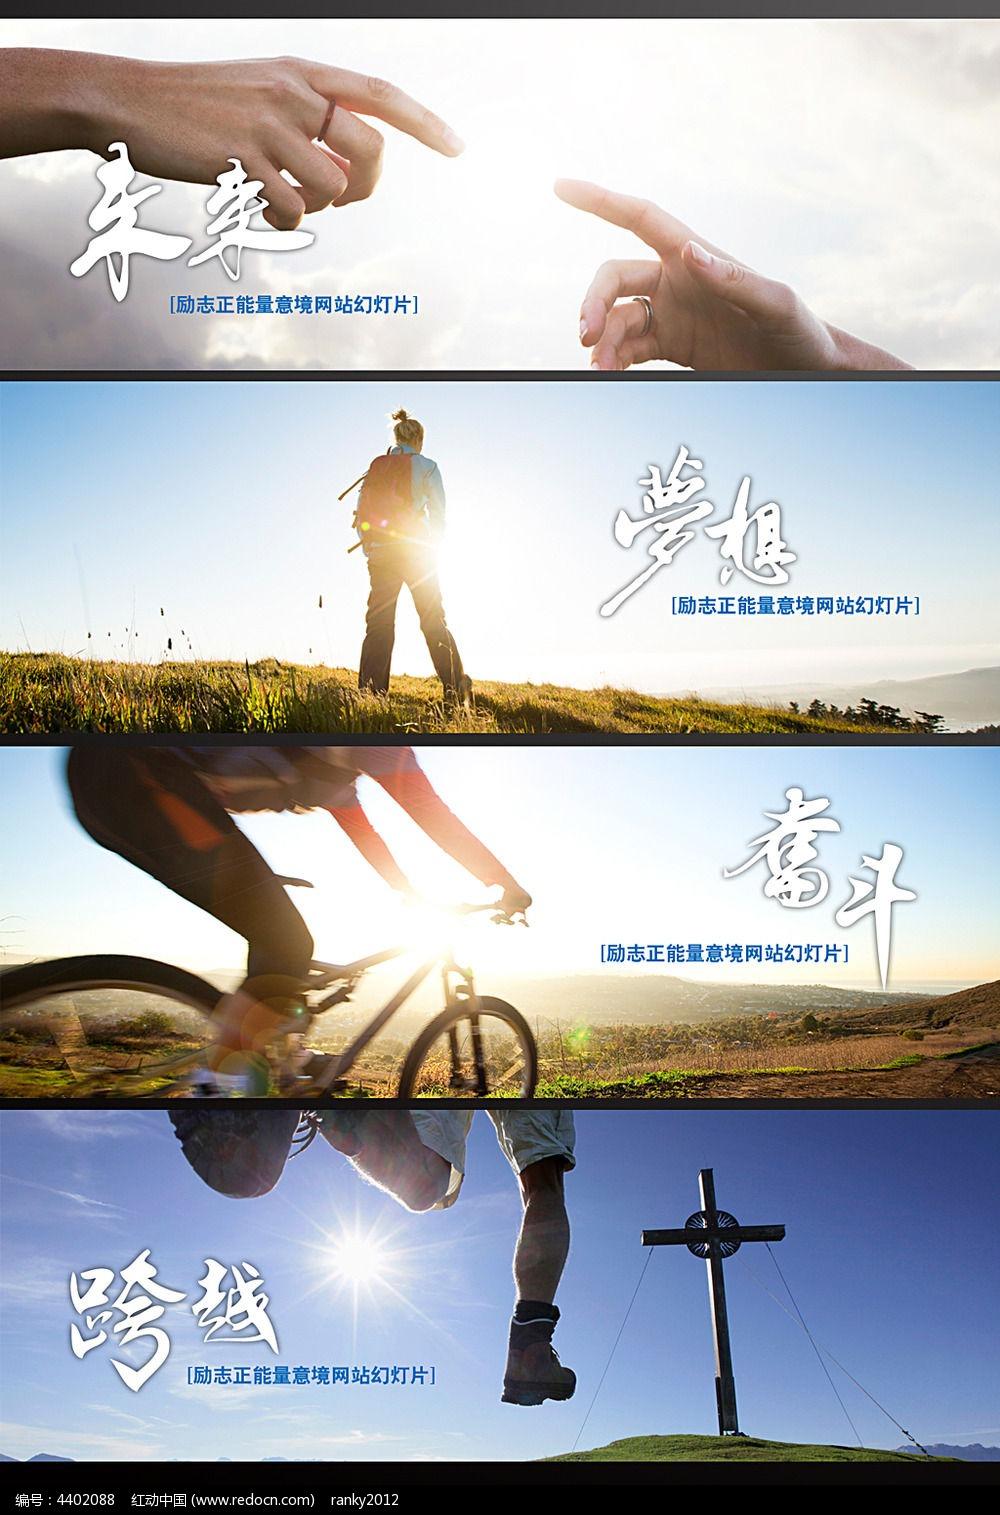 网站官网首页幻灯片励志意境banner